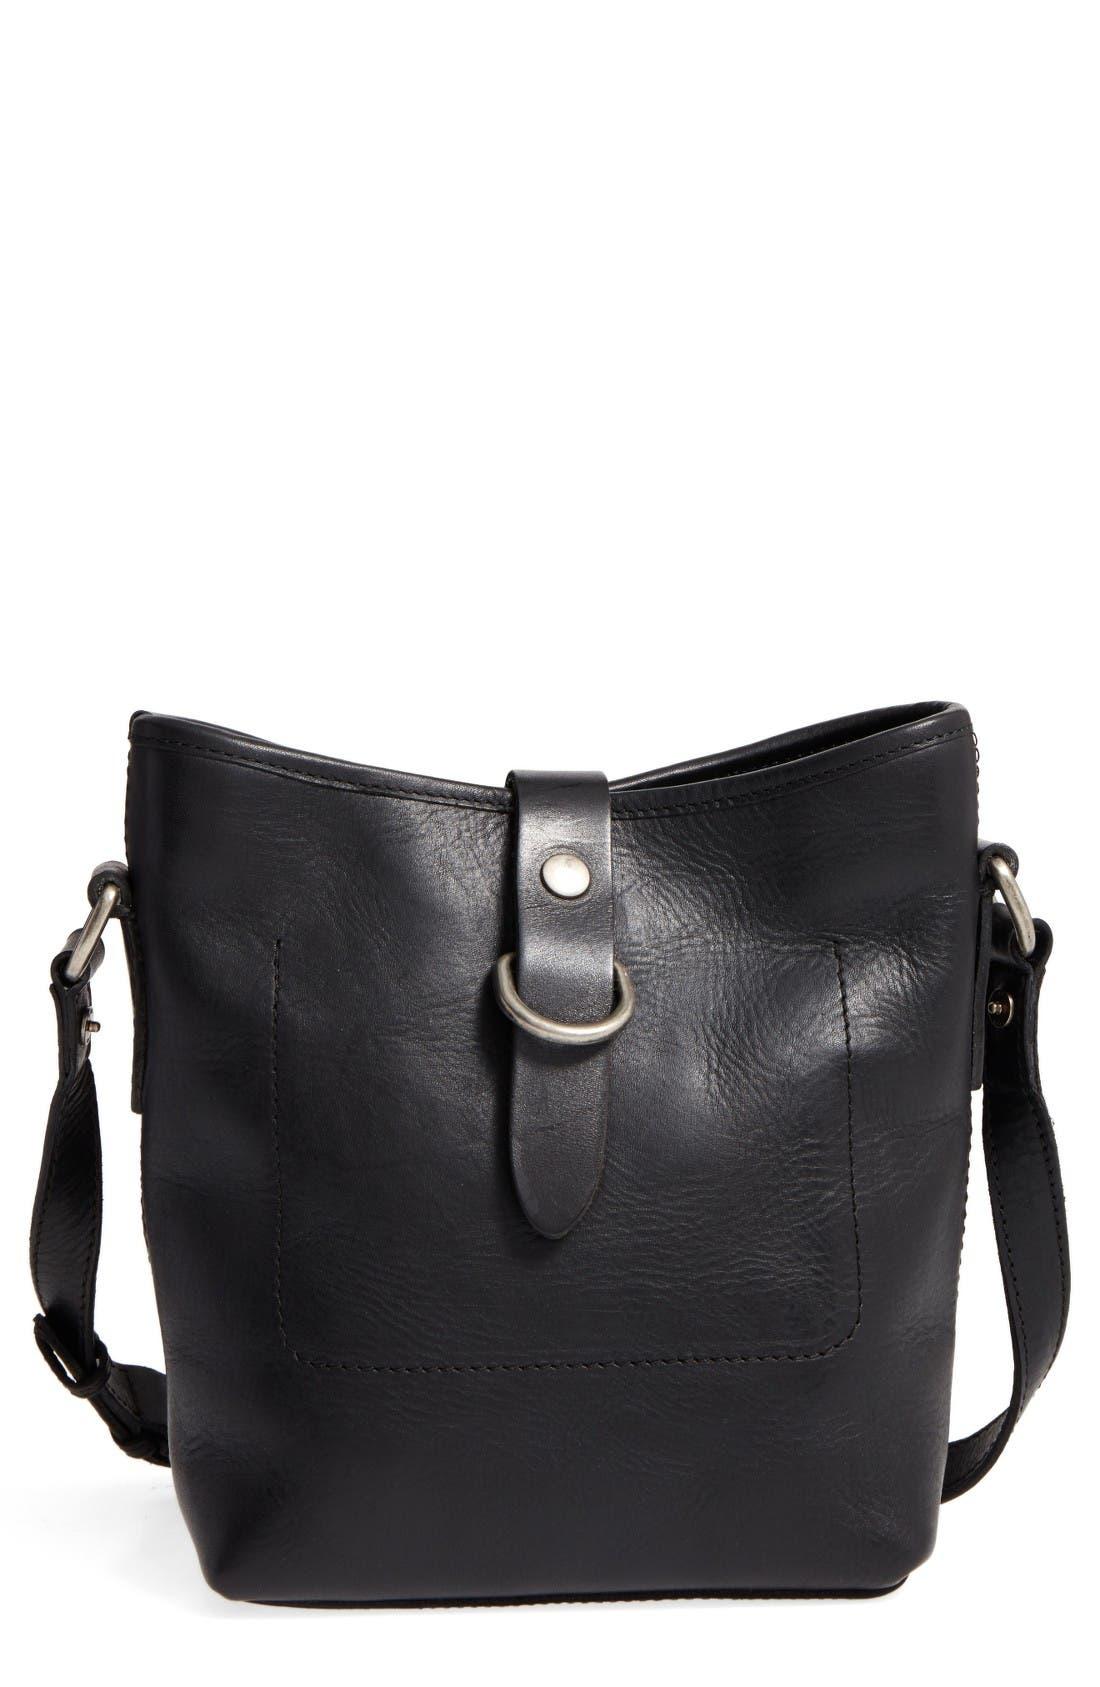 Alternate Image 1 Selected - Frye Amy Leather Crossbody Bag